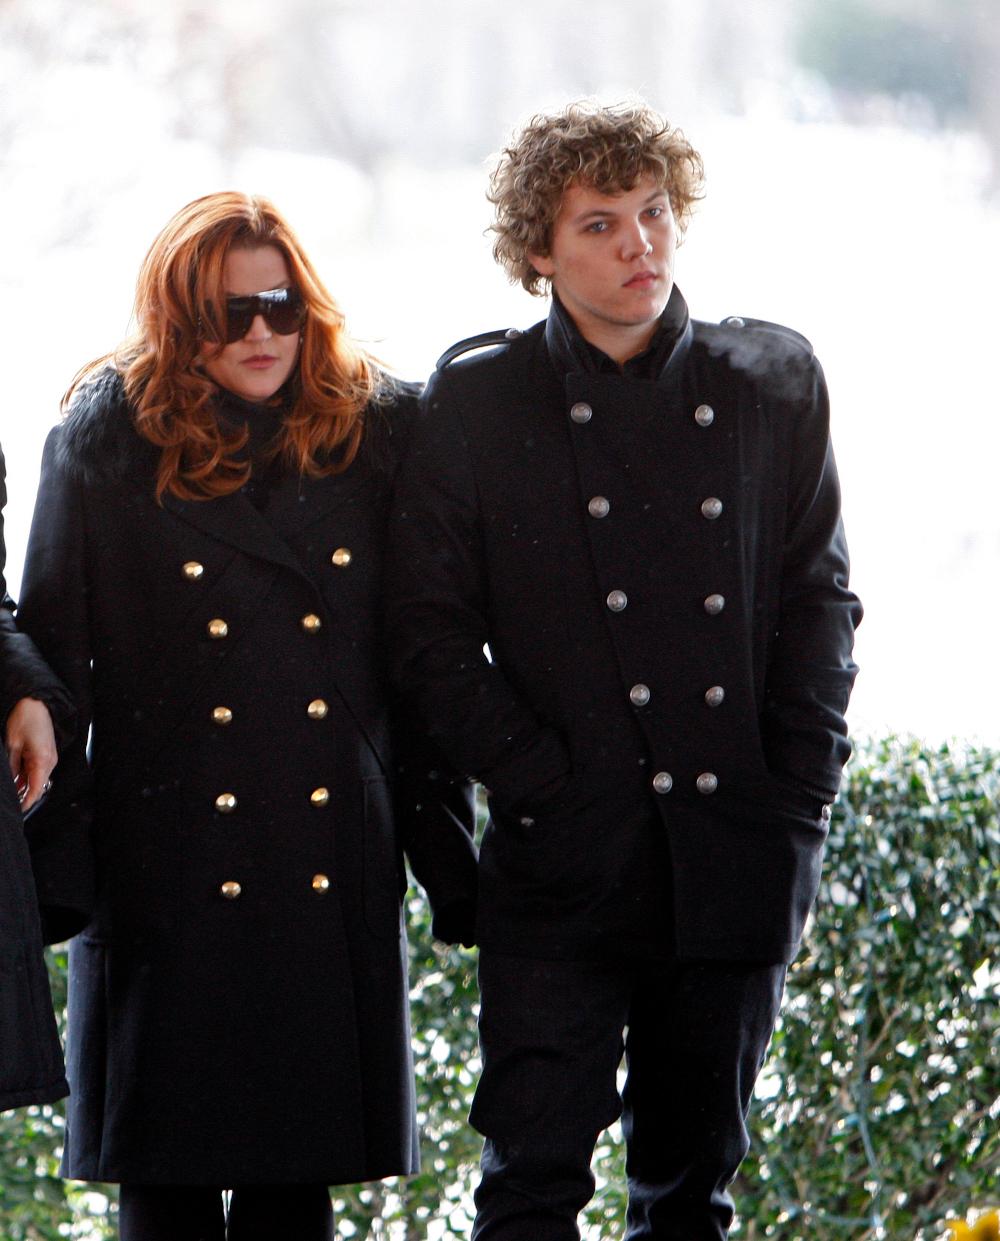 H Λίζα Μαρί Πρίσλεϊ με τον γιο της, Μπέντζαμιν